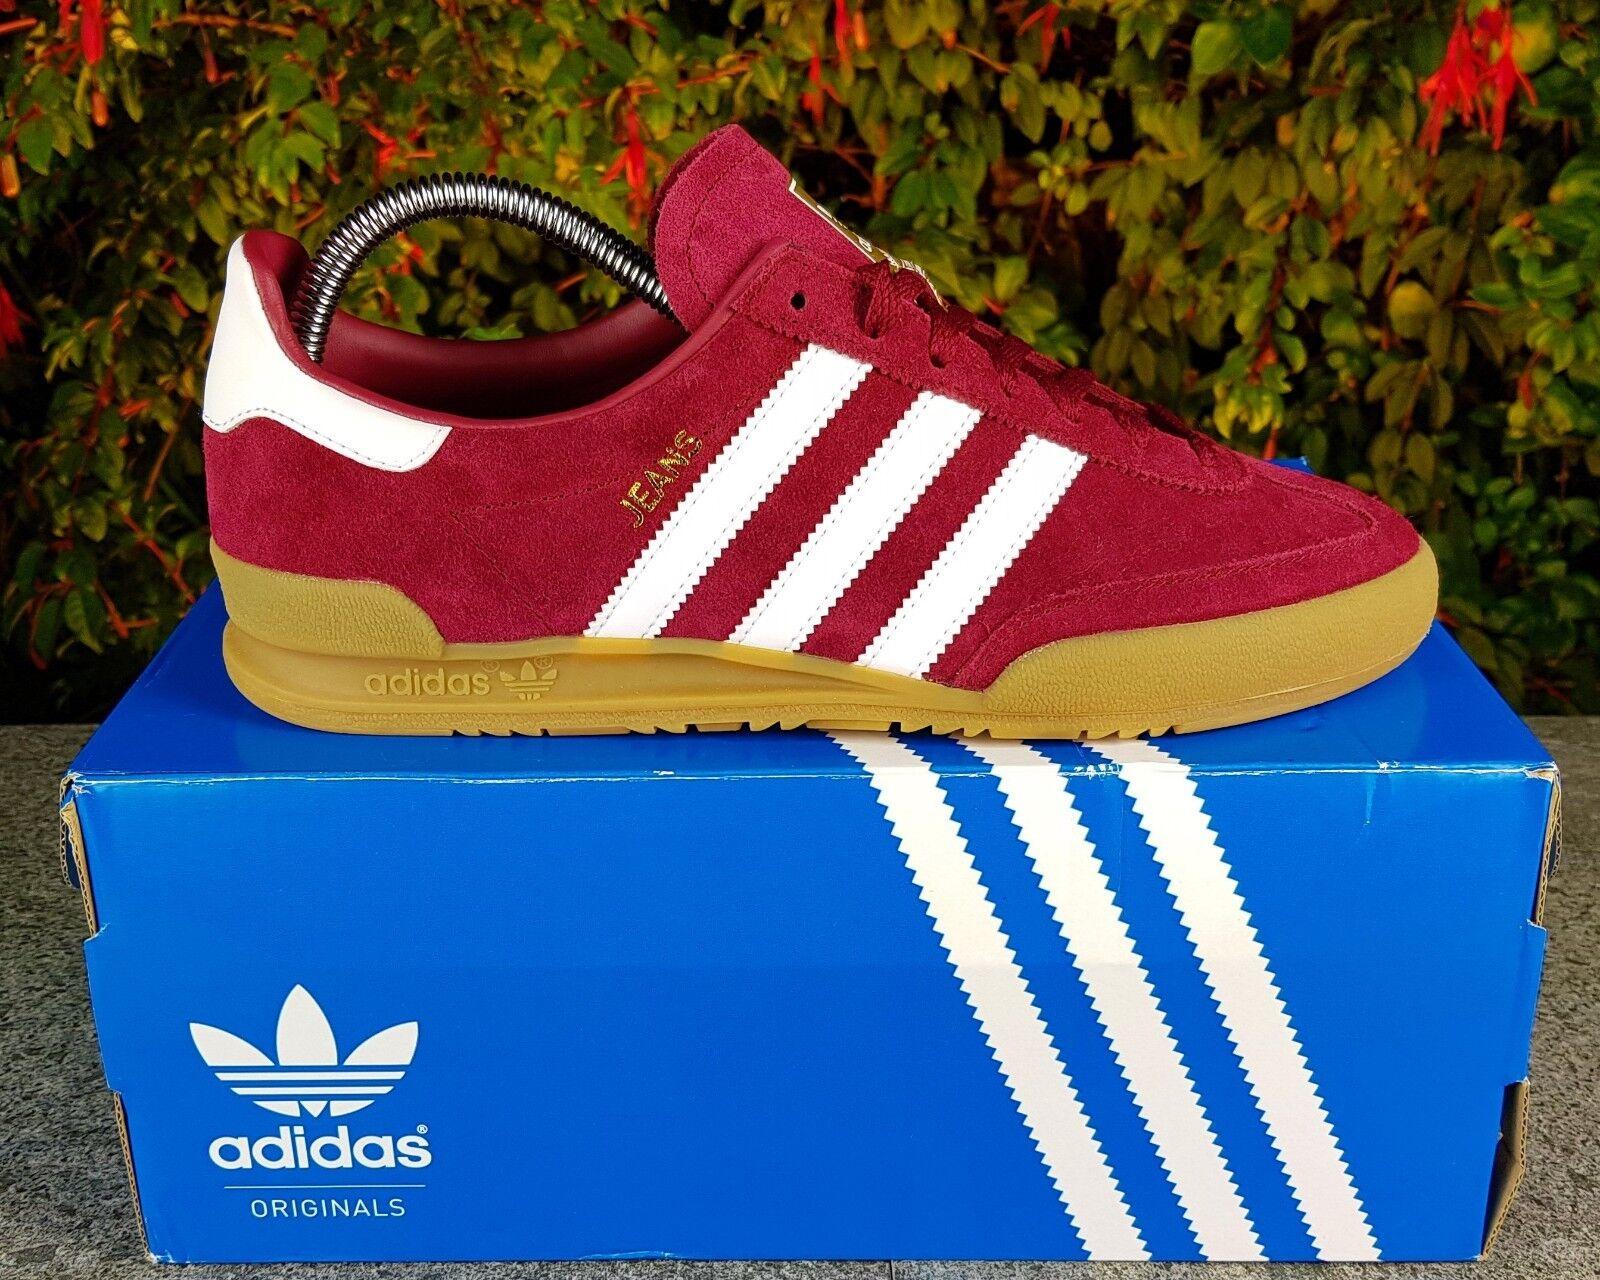 BNWB Originali Adidas Originals Jeans MkII Mk2 Mk2 Mk2 Borgogna in pelle scamosciata scarpe da ginnastica | Moderno Ed Elegante A Moda  | Scolaro/Signora Scarpa  62c20c